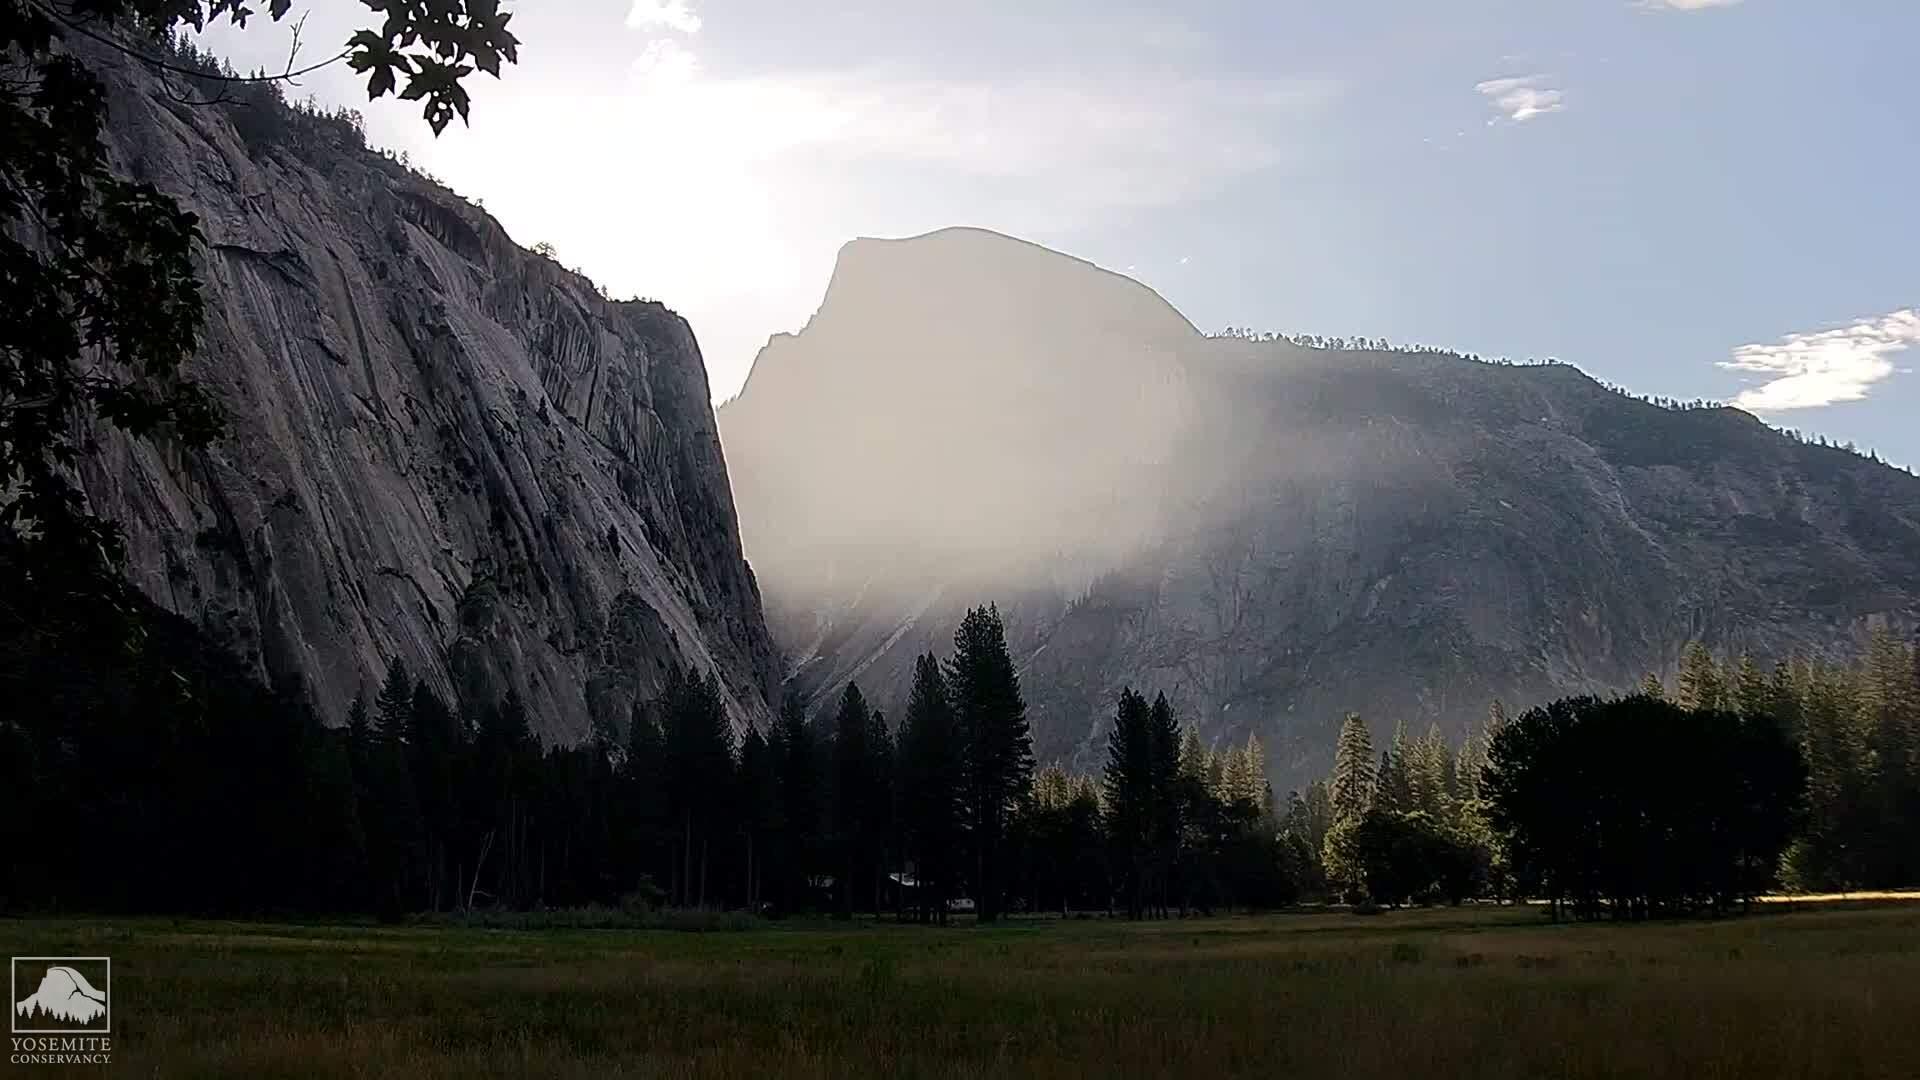 Yosemite National Park, California Wed. 07:45